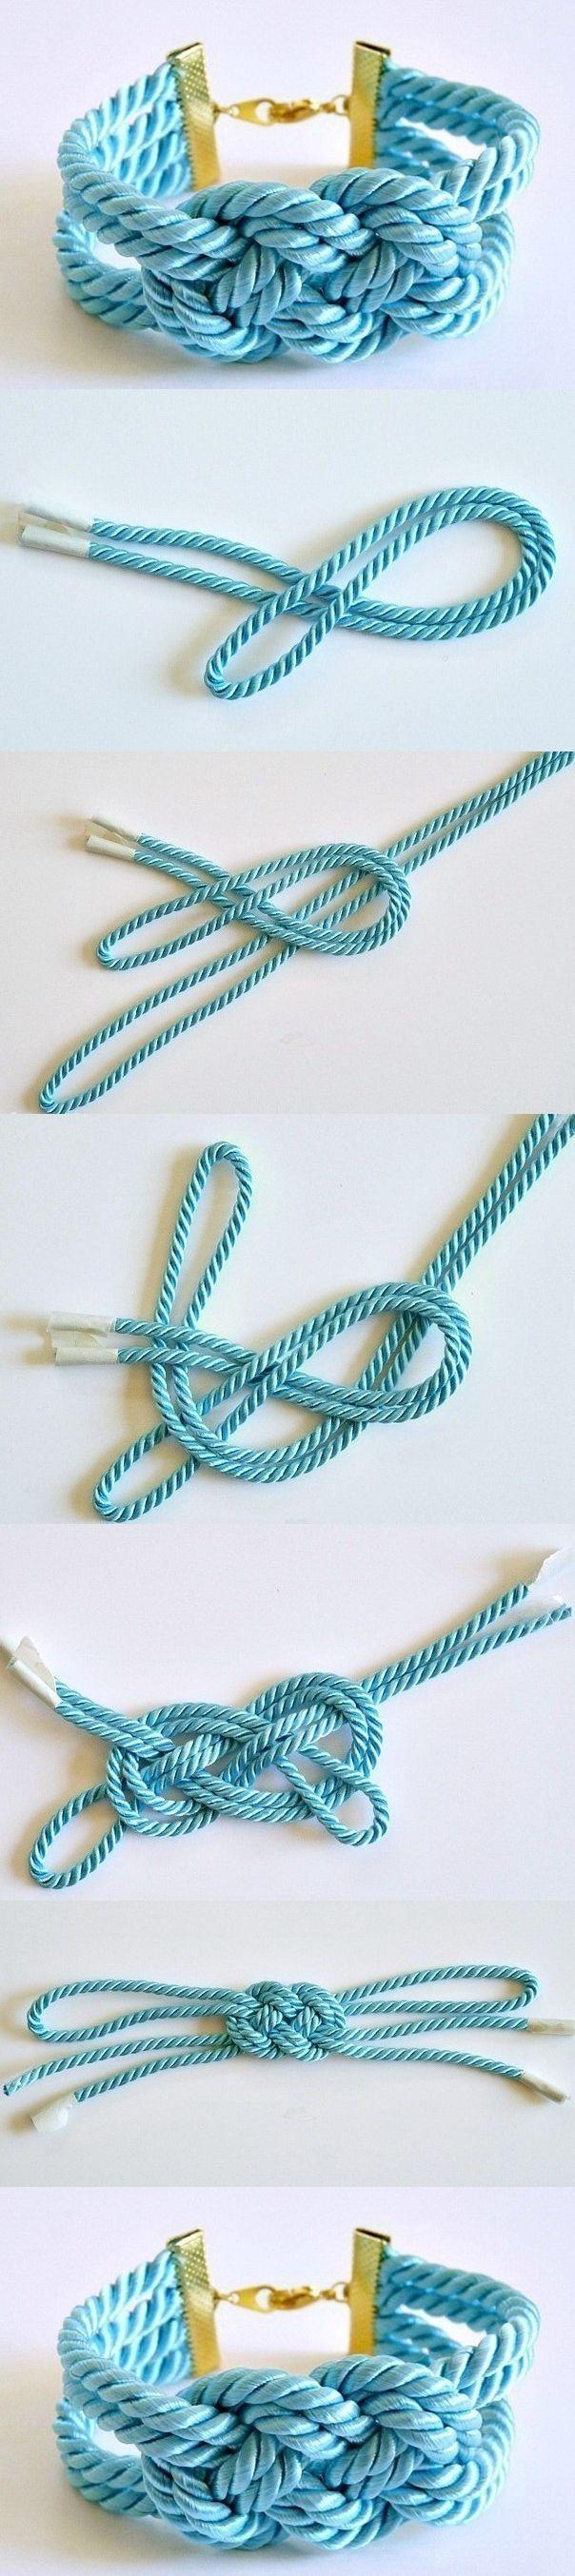 DIY Knotted Stylish Cord Bracelet | www.FabArtDIY.com LIKE Us on Facebook == https://www.facebook.com/FabArtDIY